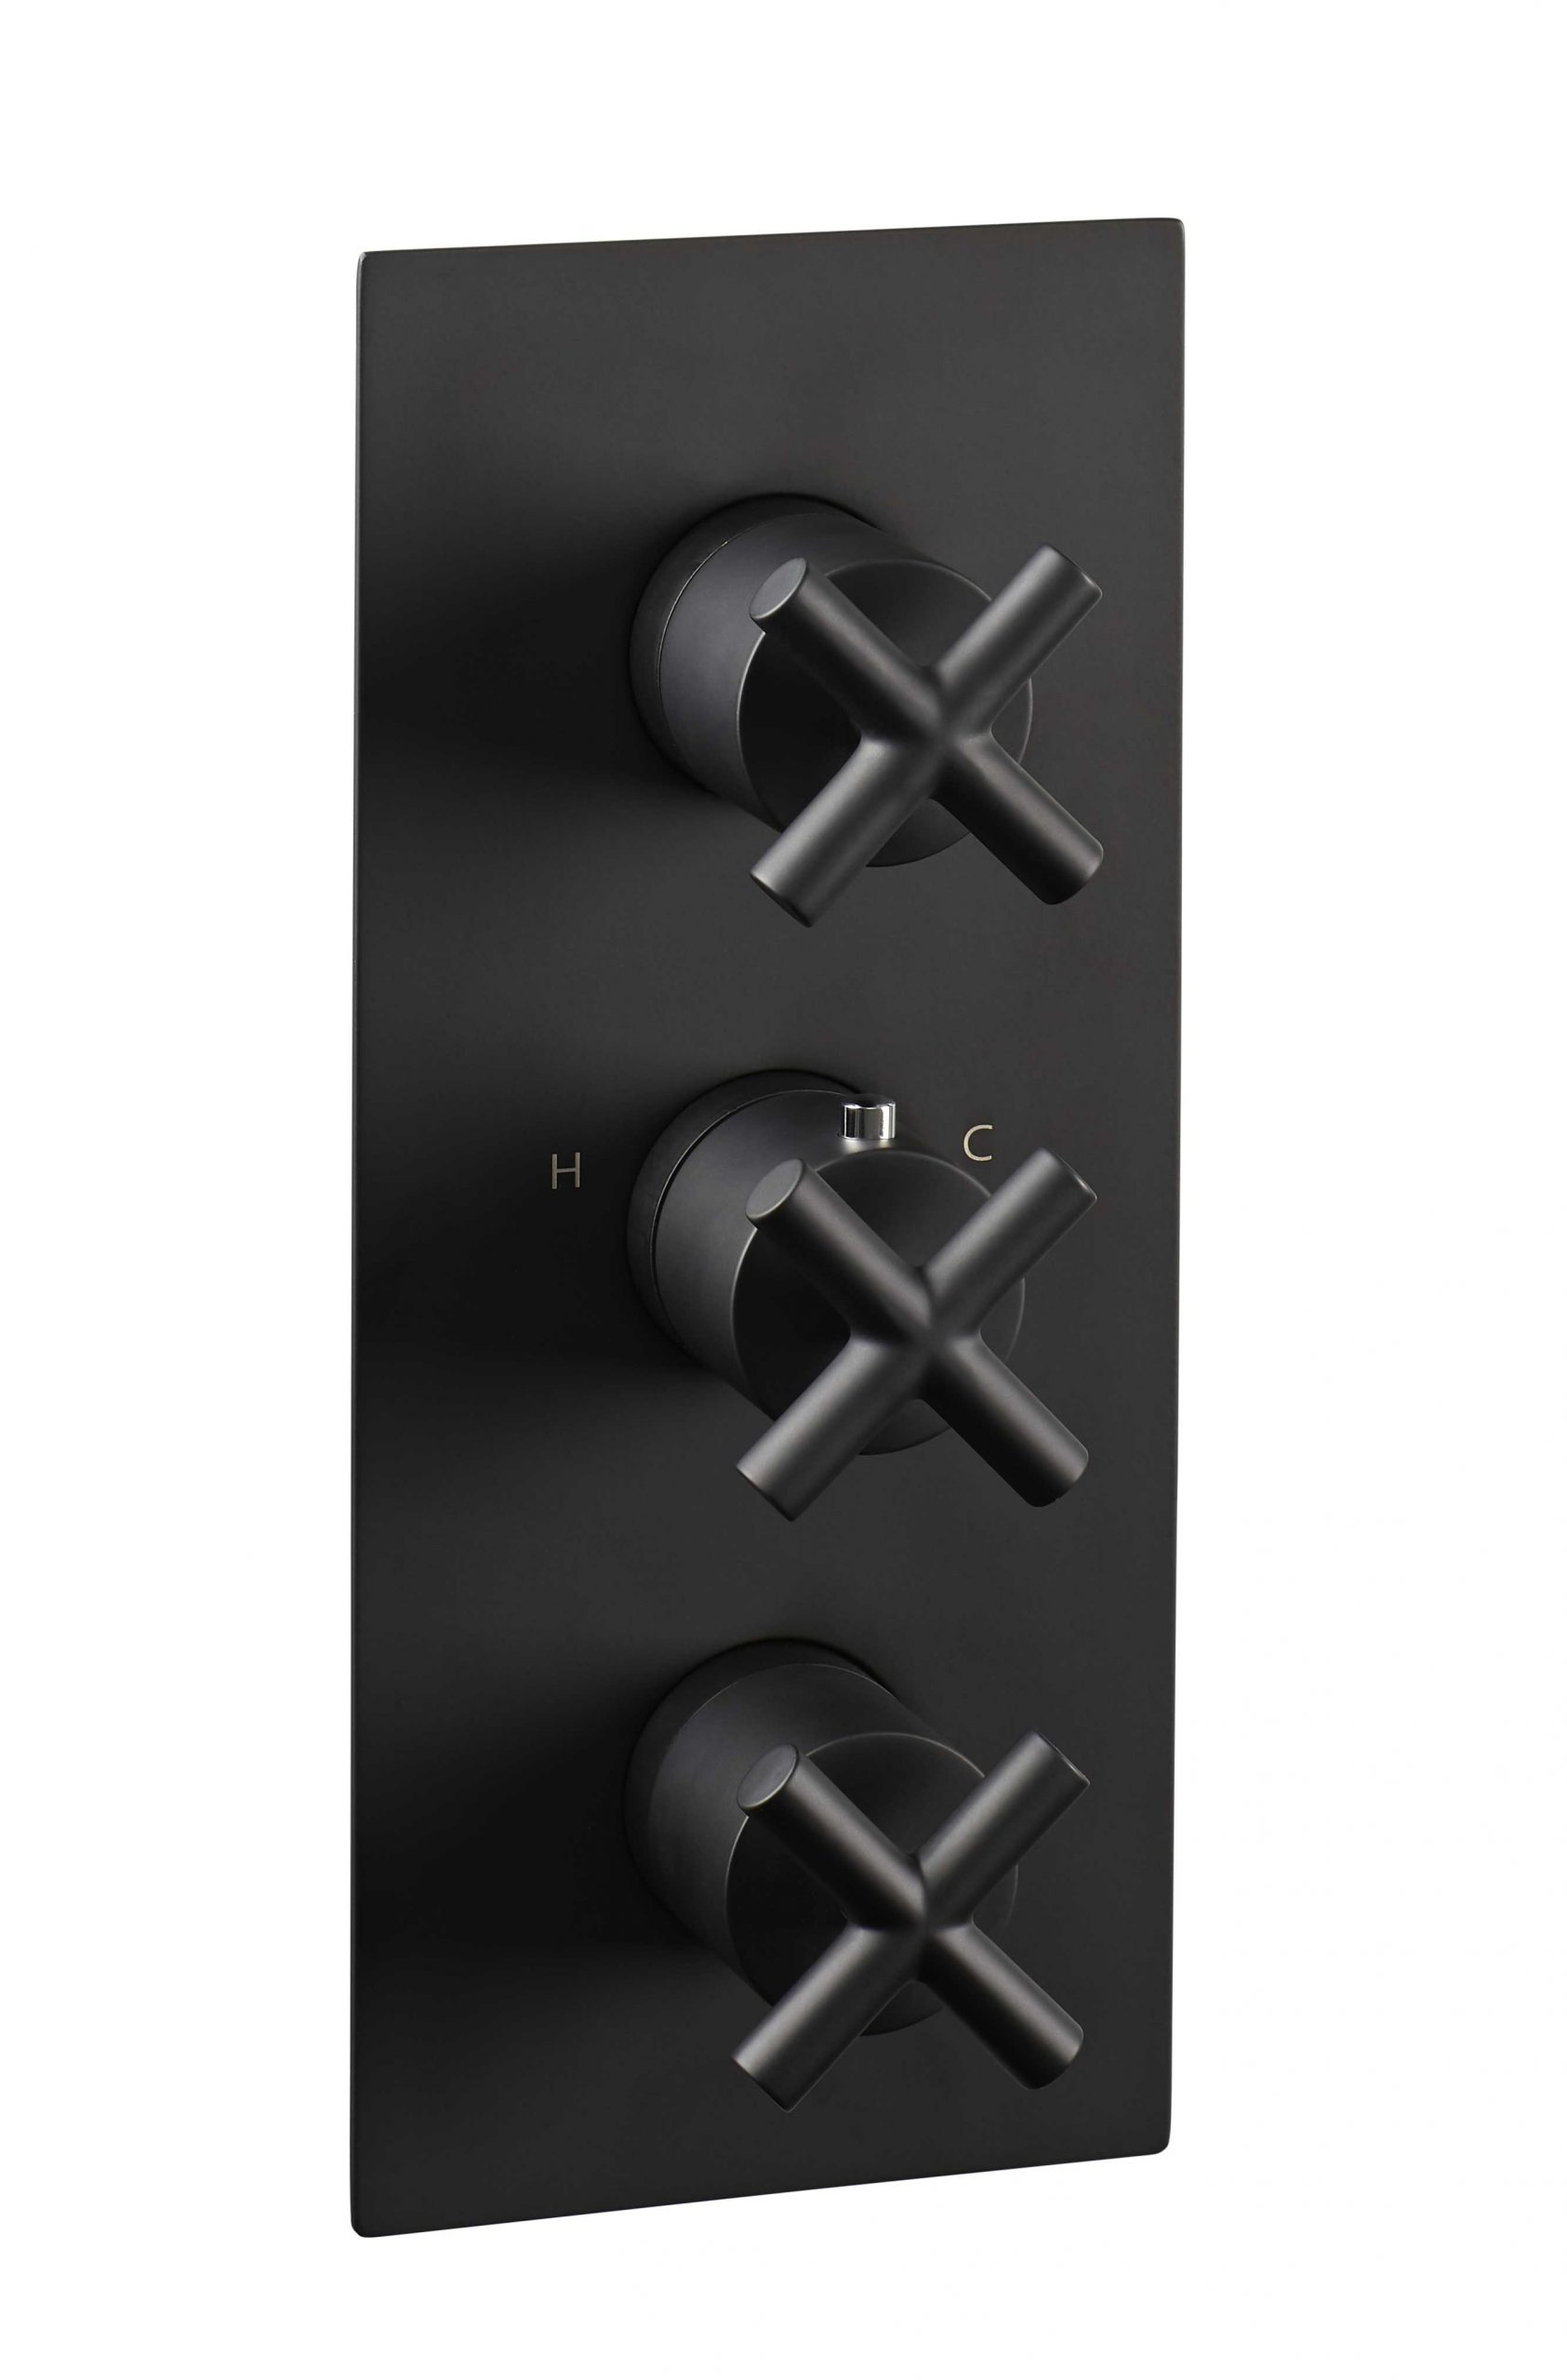 Solex thermostatic concealed 2 outlet shower valve, vertical